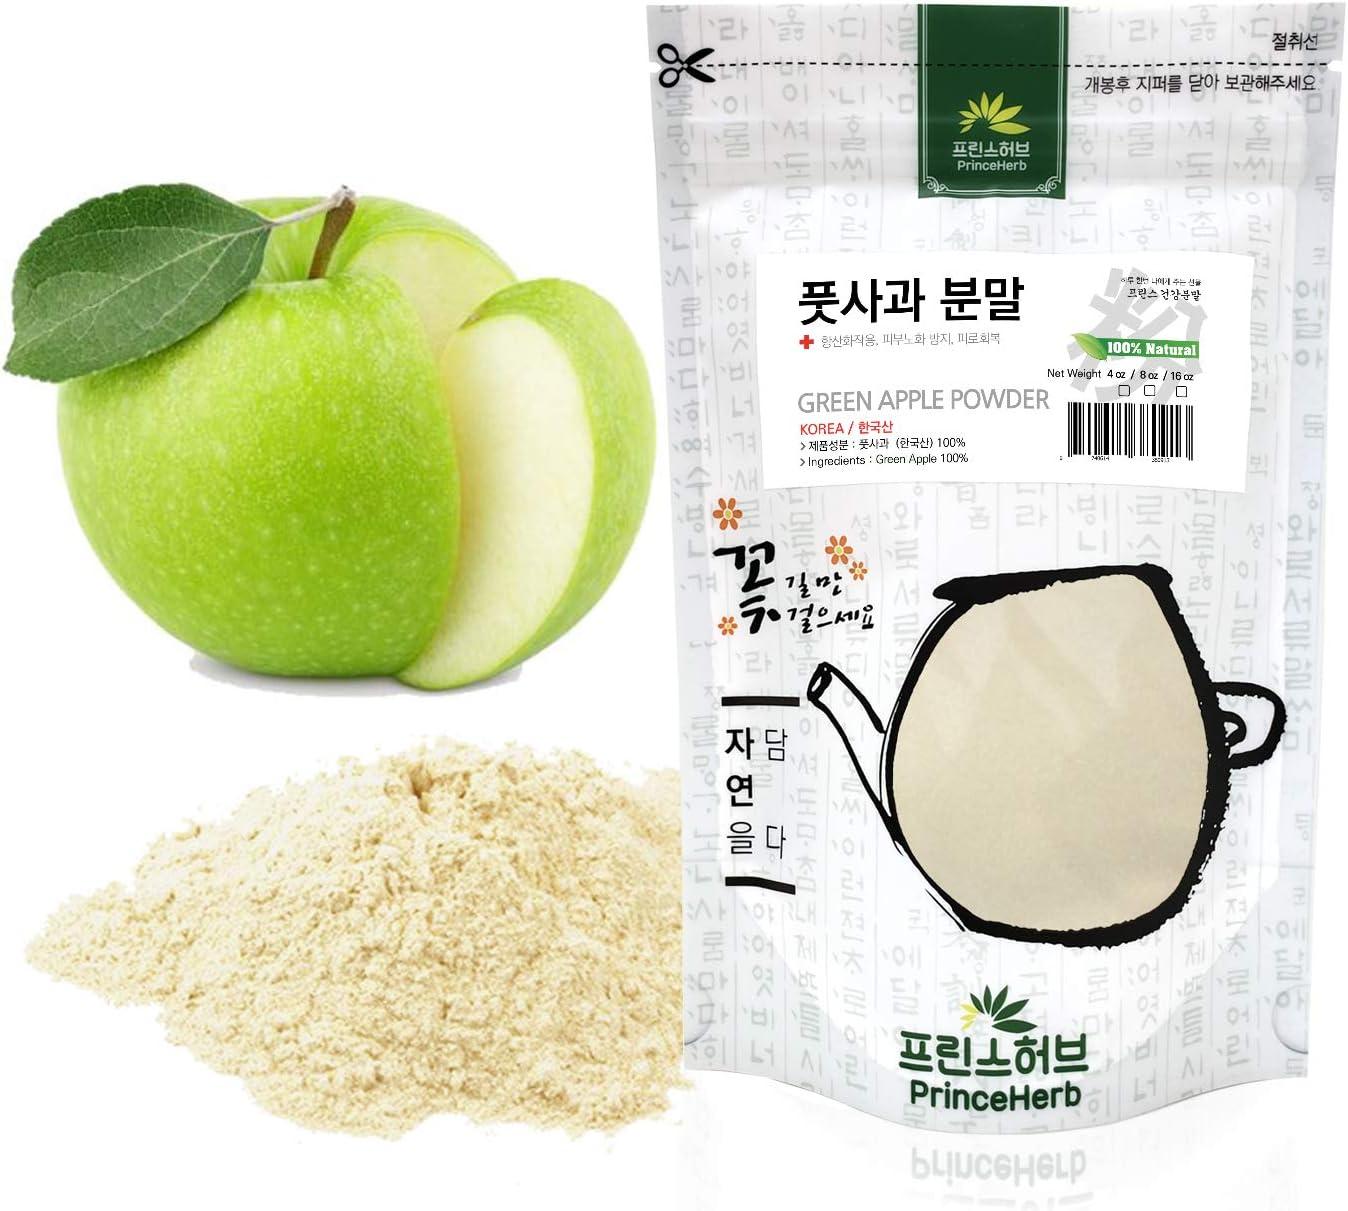 [Medicinal Korean Herbal Powder] 100% Natural Weight Loss Green Apple Powder (Qing Pingguo/풋사과 가루) (8 oz)